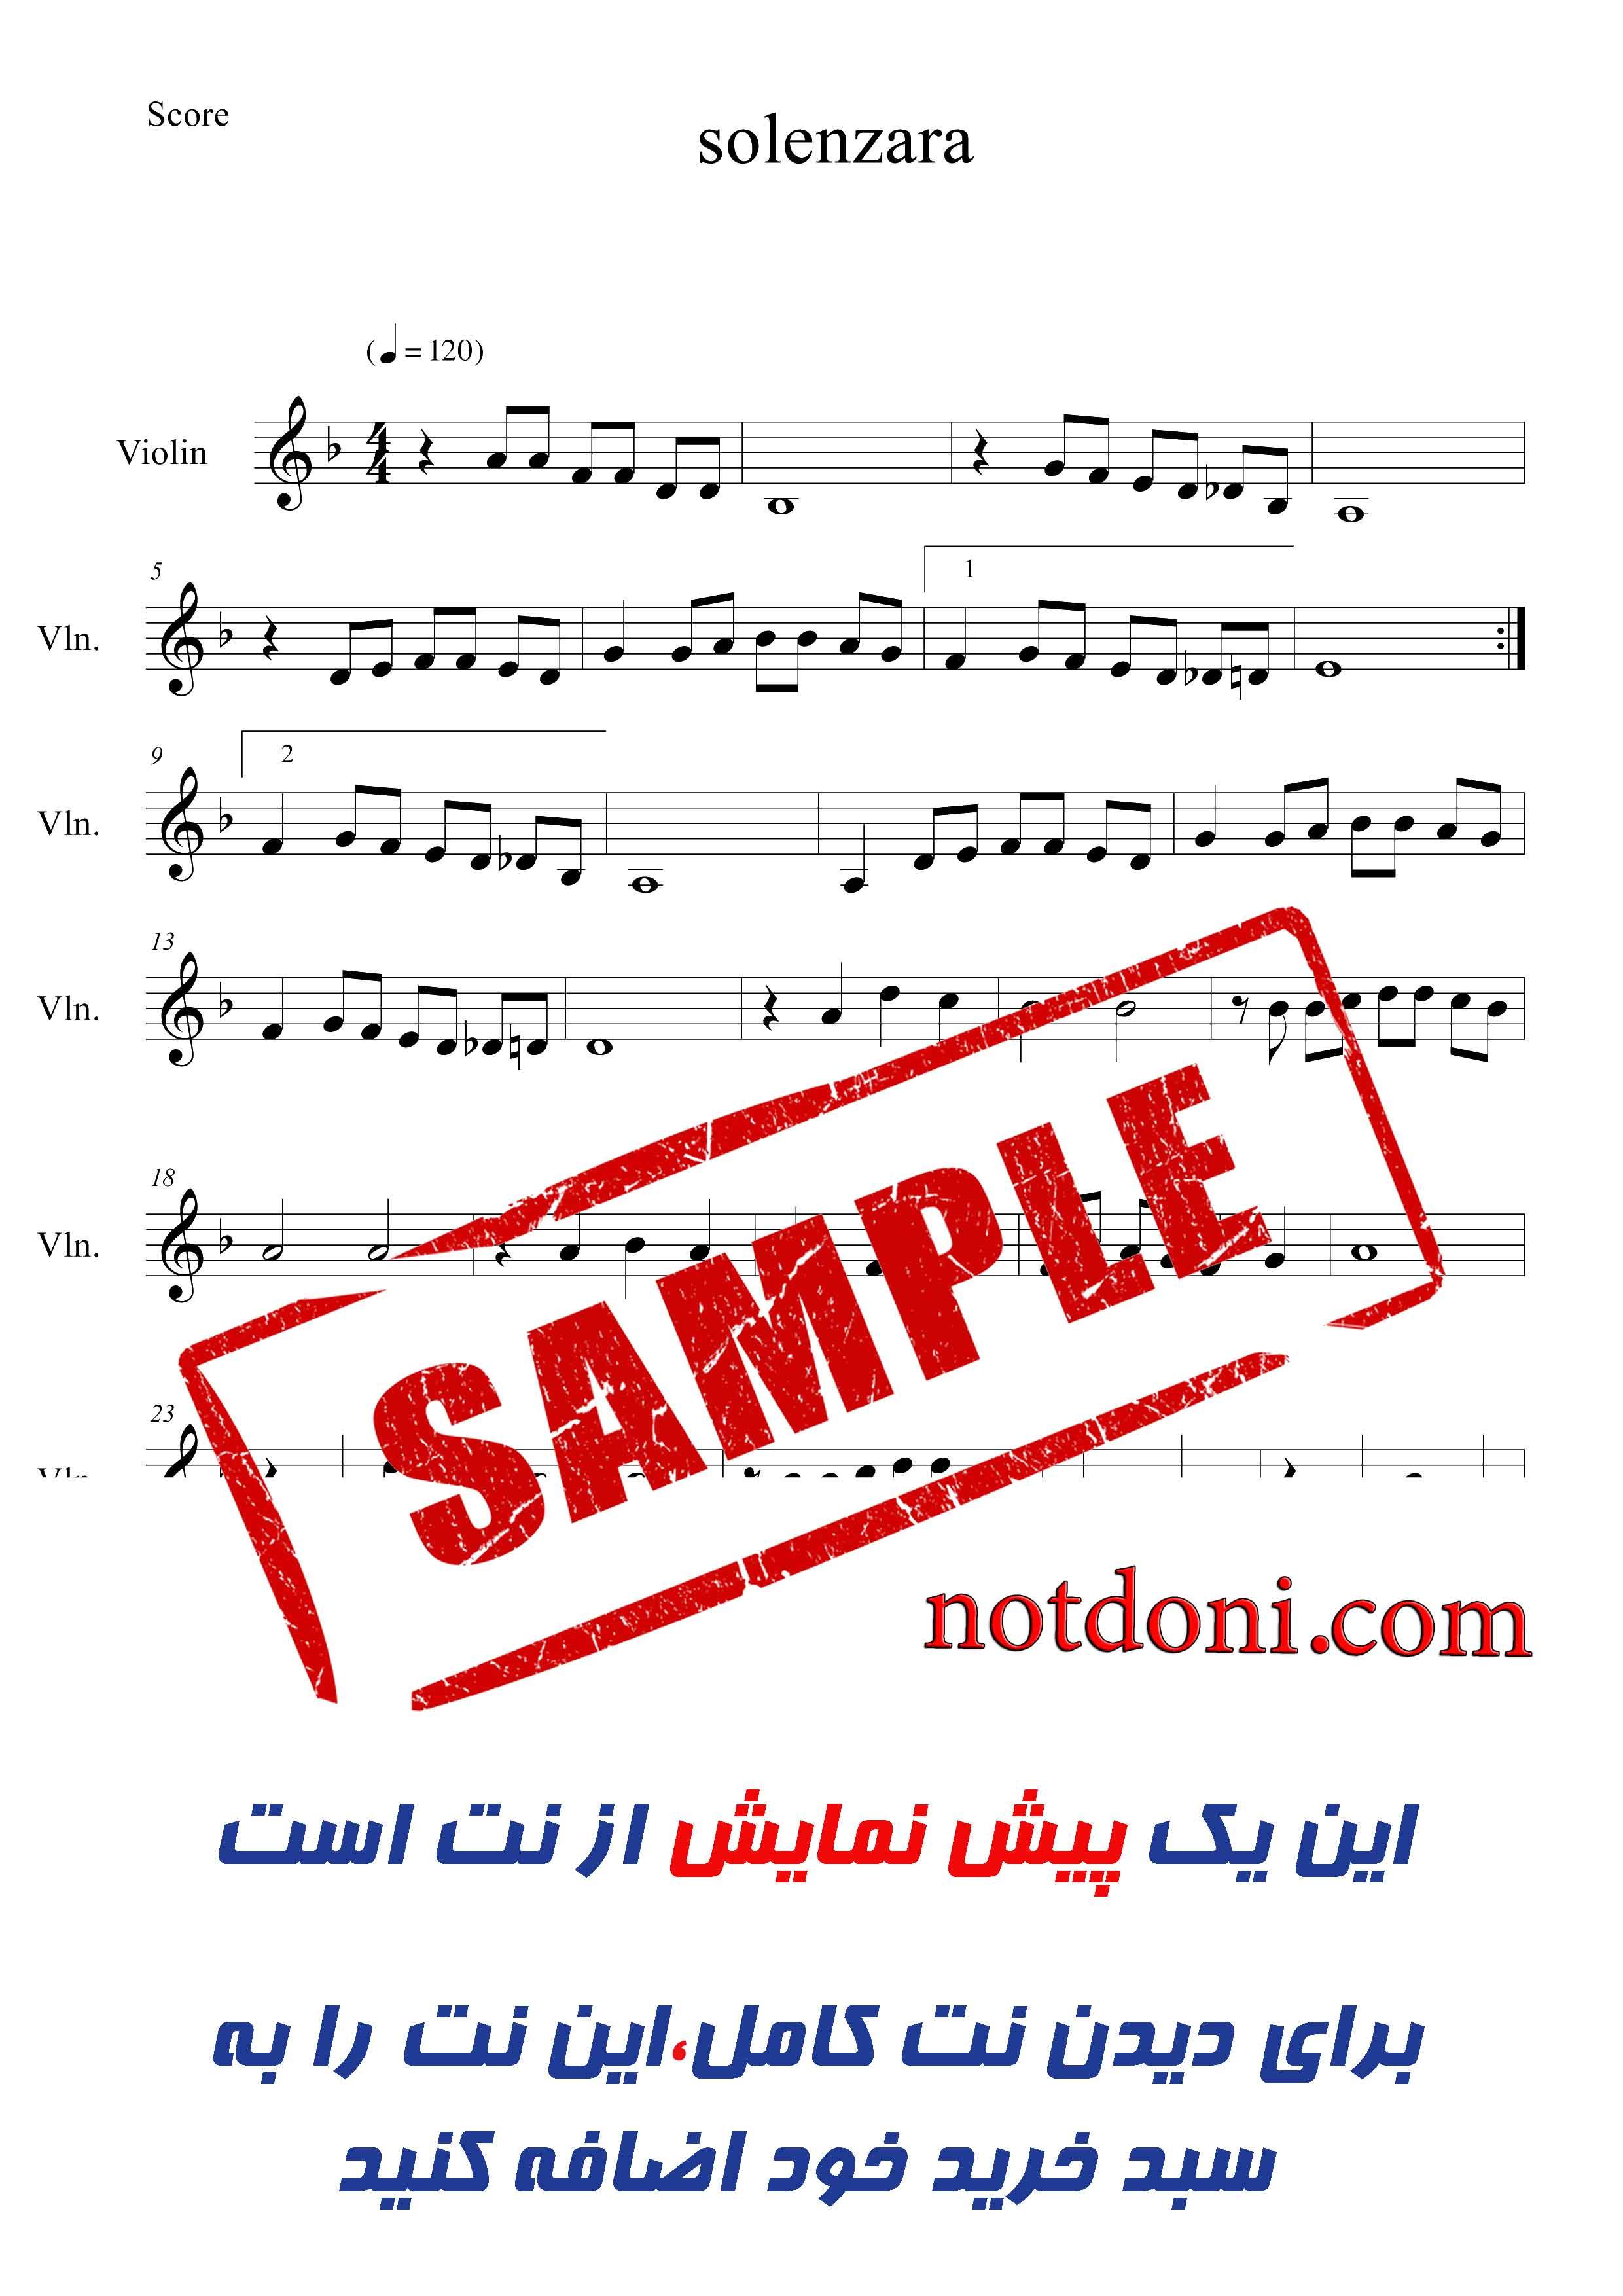 fa11a8e7-4d0f-4a3e-8db3-b506083cc993_نت-آهنگ.jpg